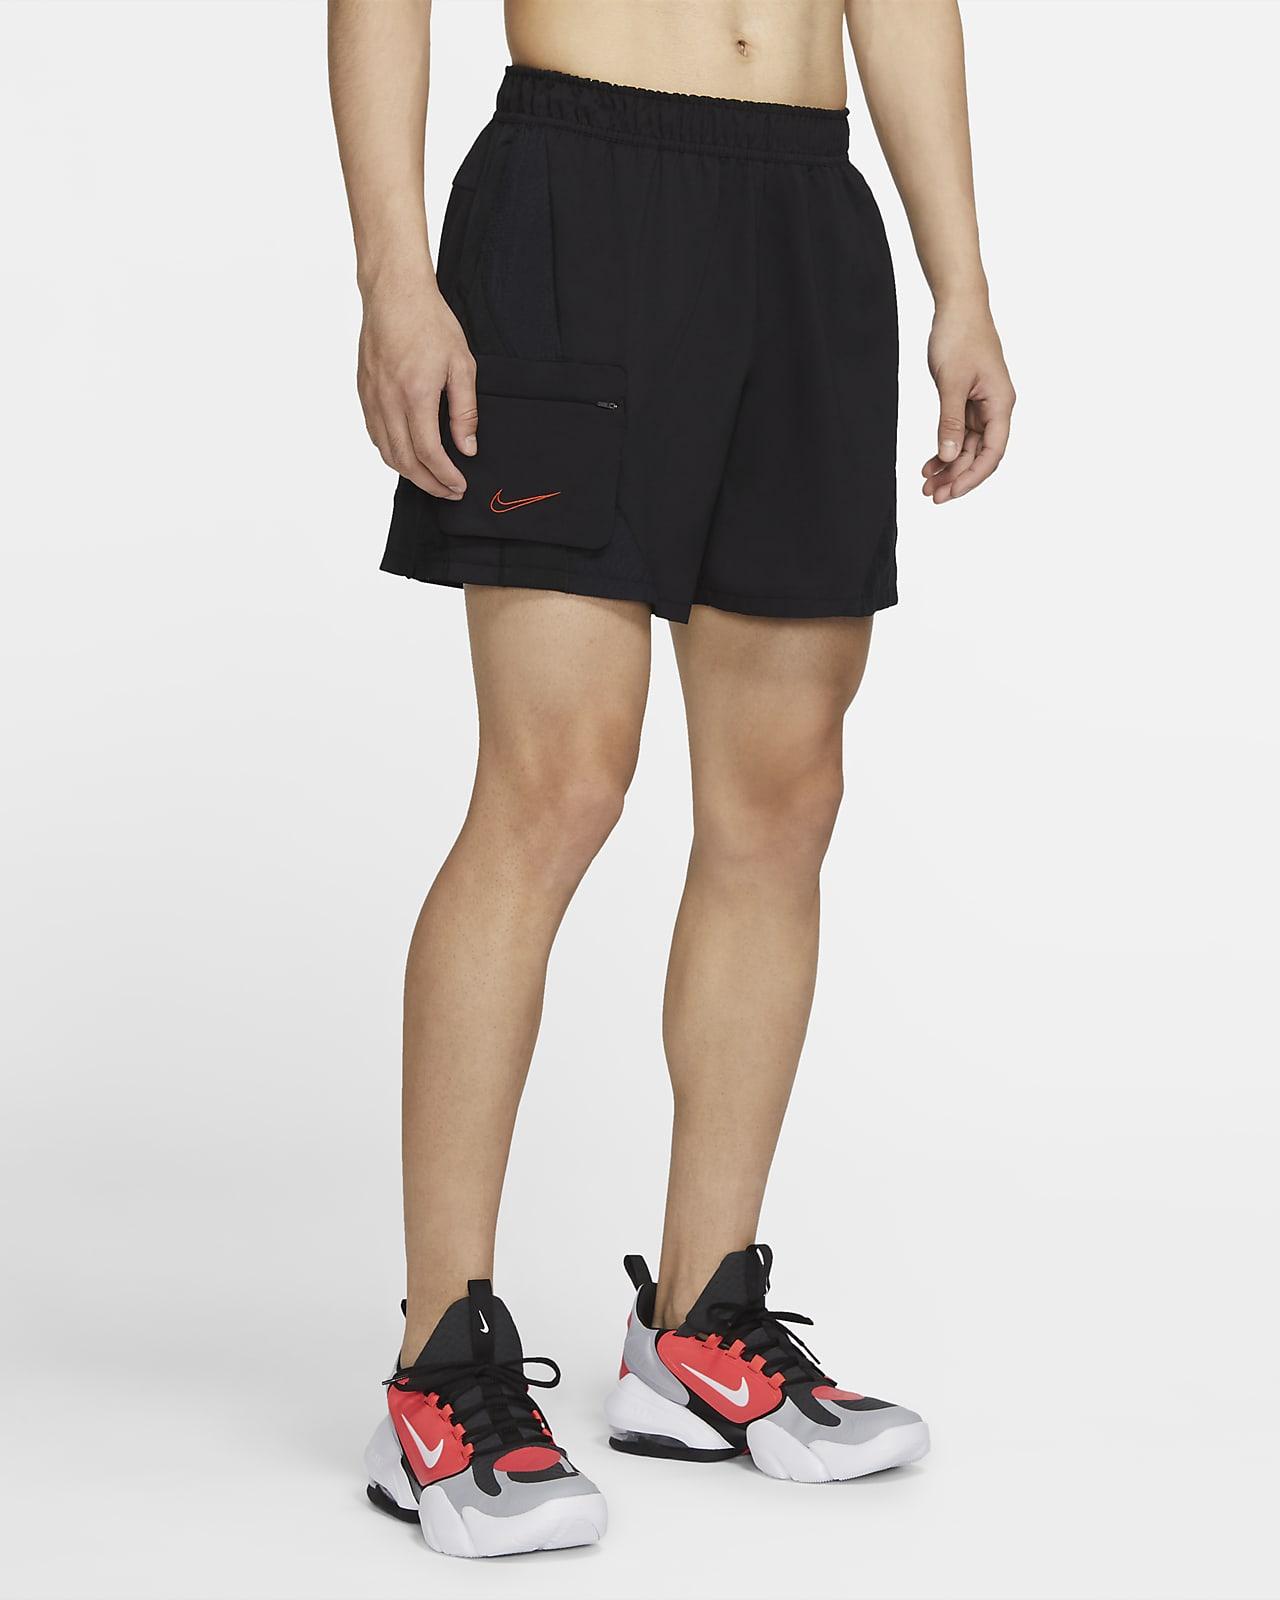 Nike Herren-Trainingsshorts